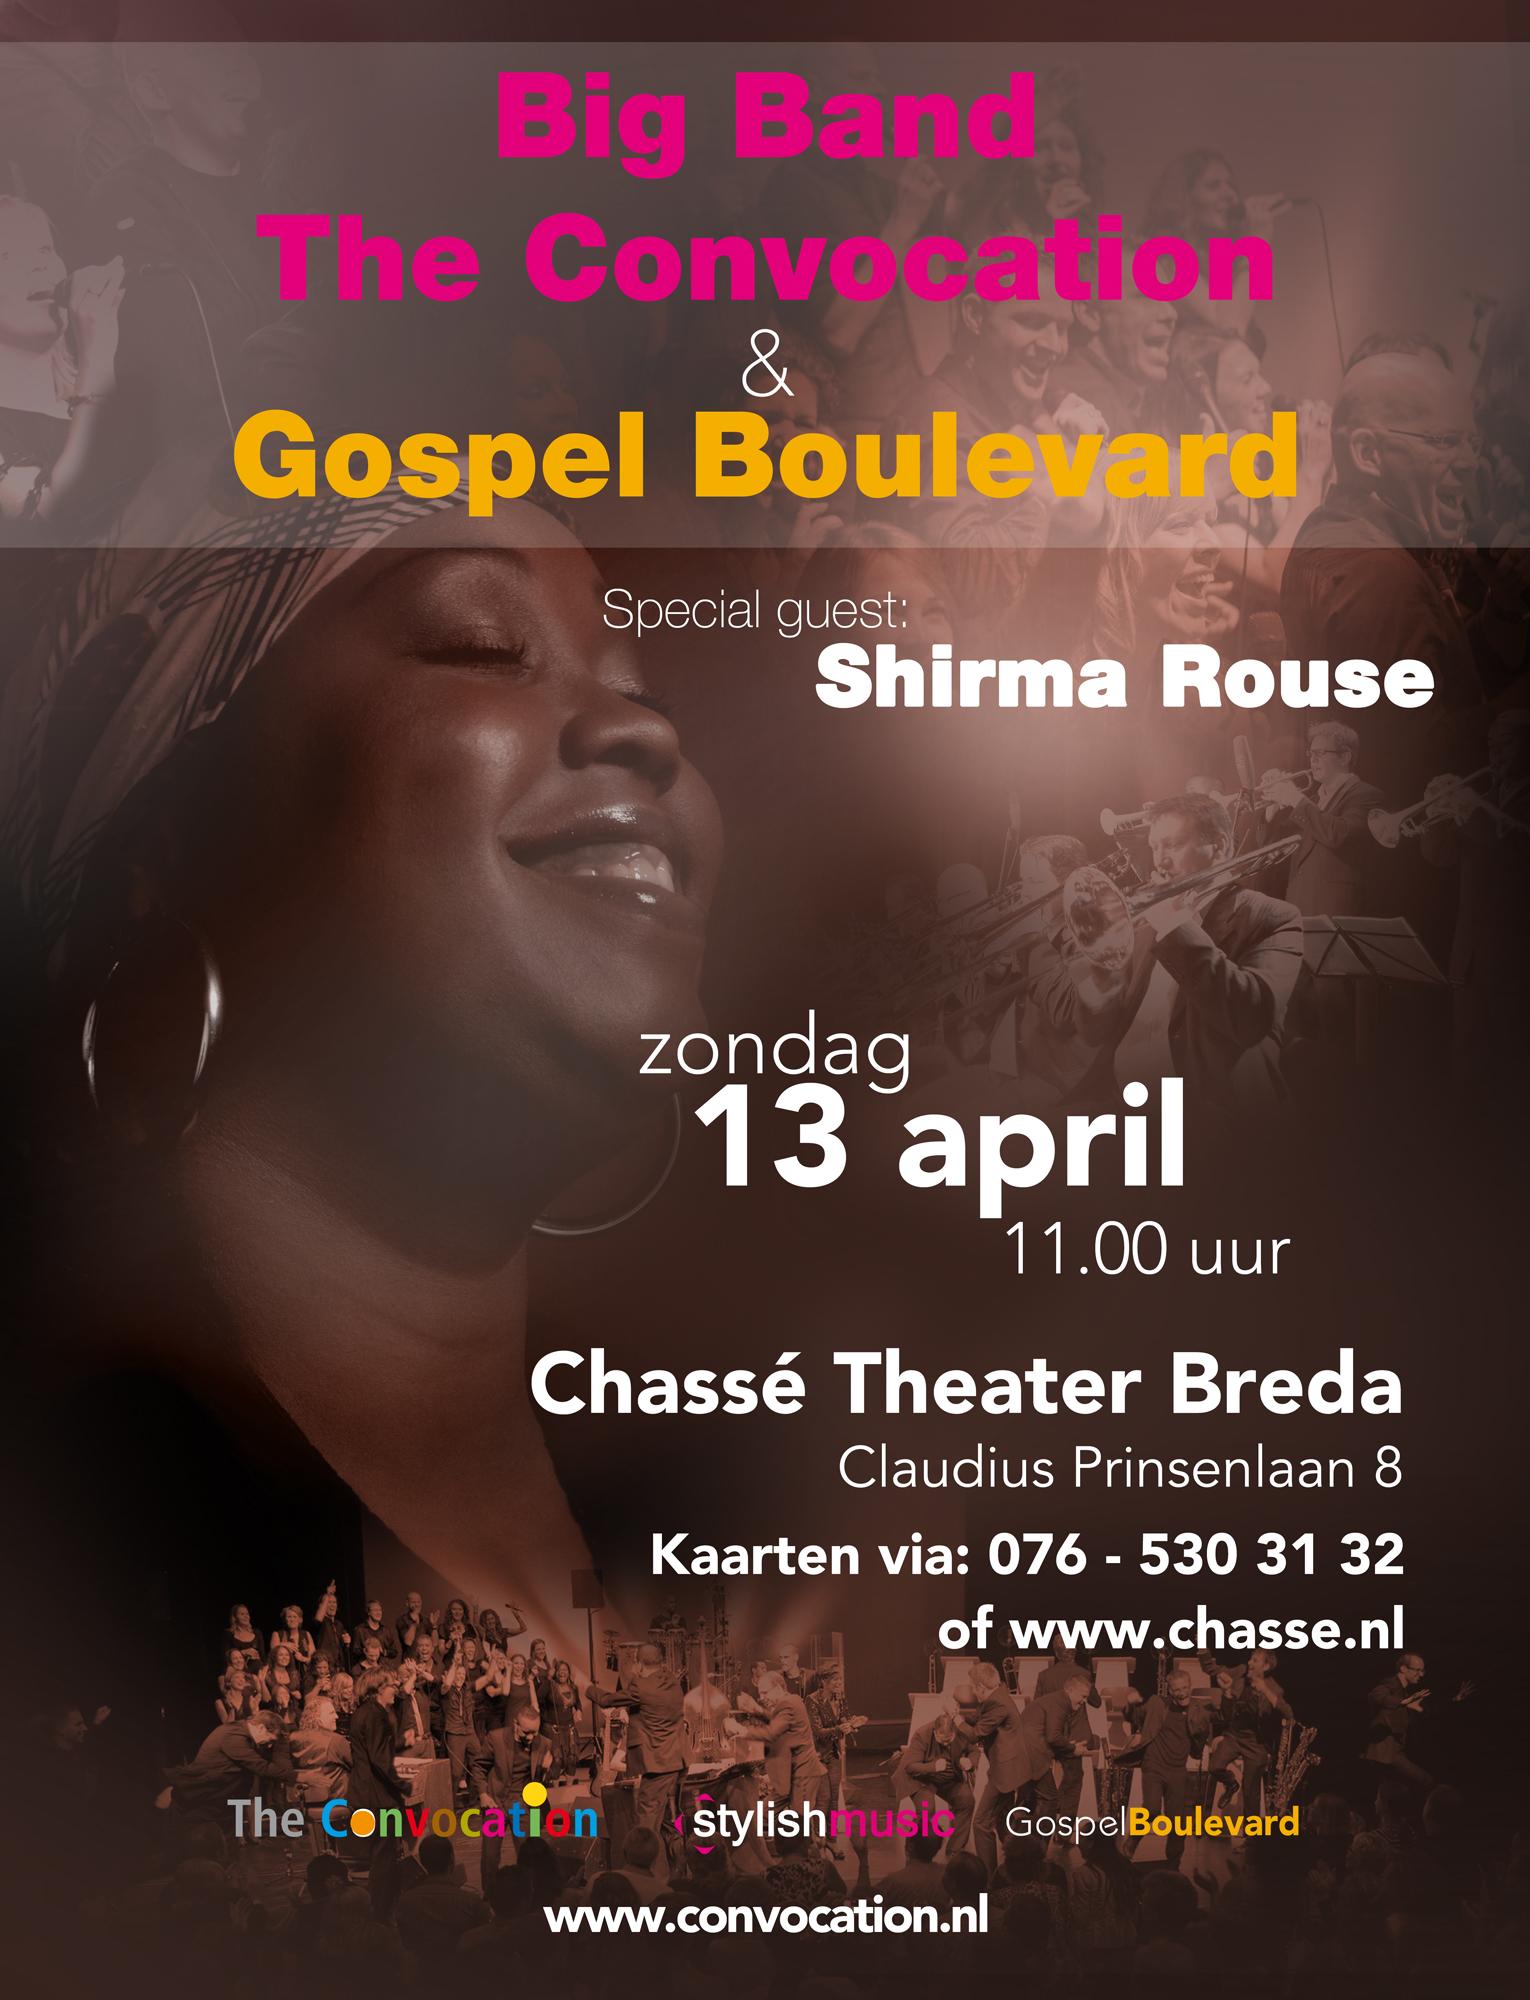 gospel boulevard-shirma rouse